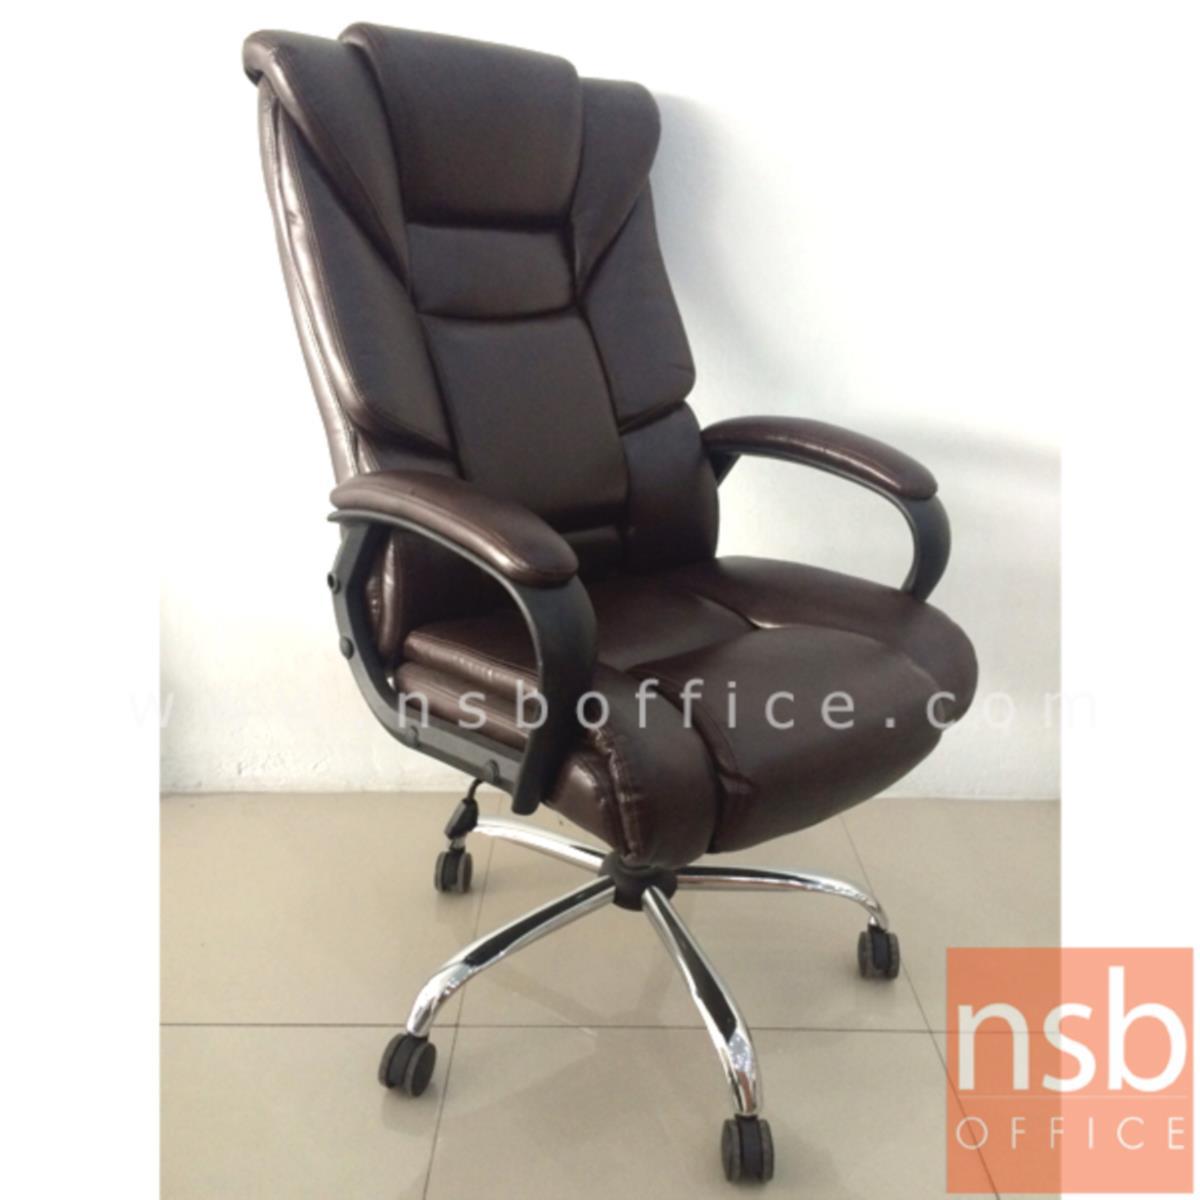 B01A395:เก้าอี้ผู้บริหาร รุ่น Cornell (ตอร์เนลล์)  โช๊คแก๊ส มีก้อนโยก ขาเหล็กชุบโครเมี่ยม